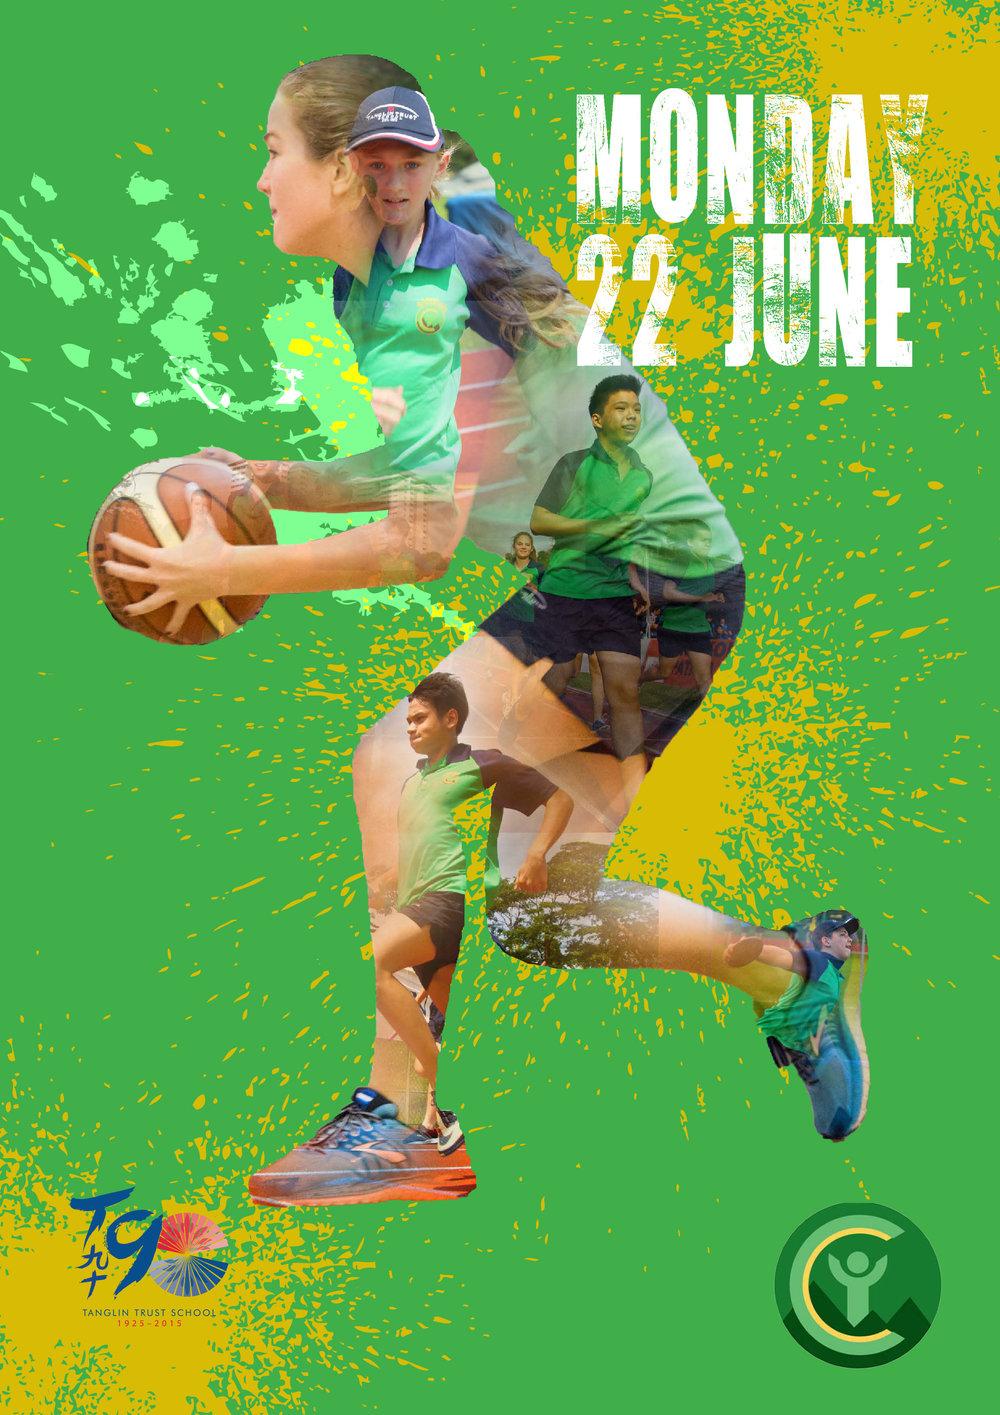 Sports Day Poster 2.jpg